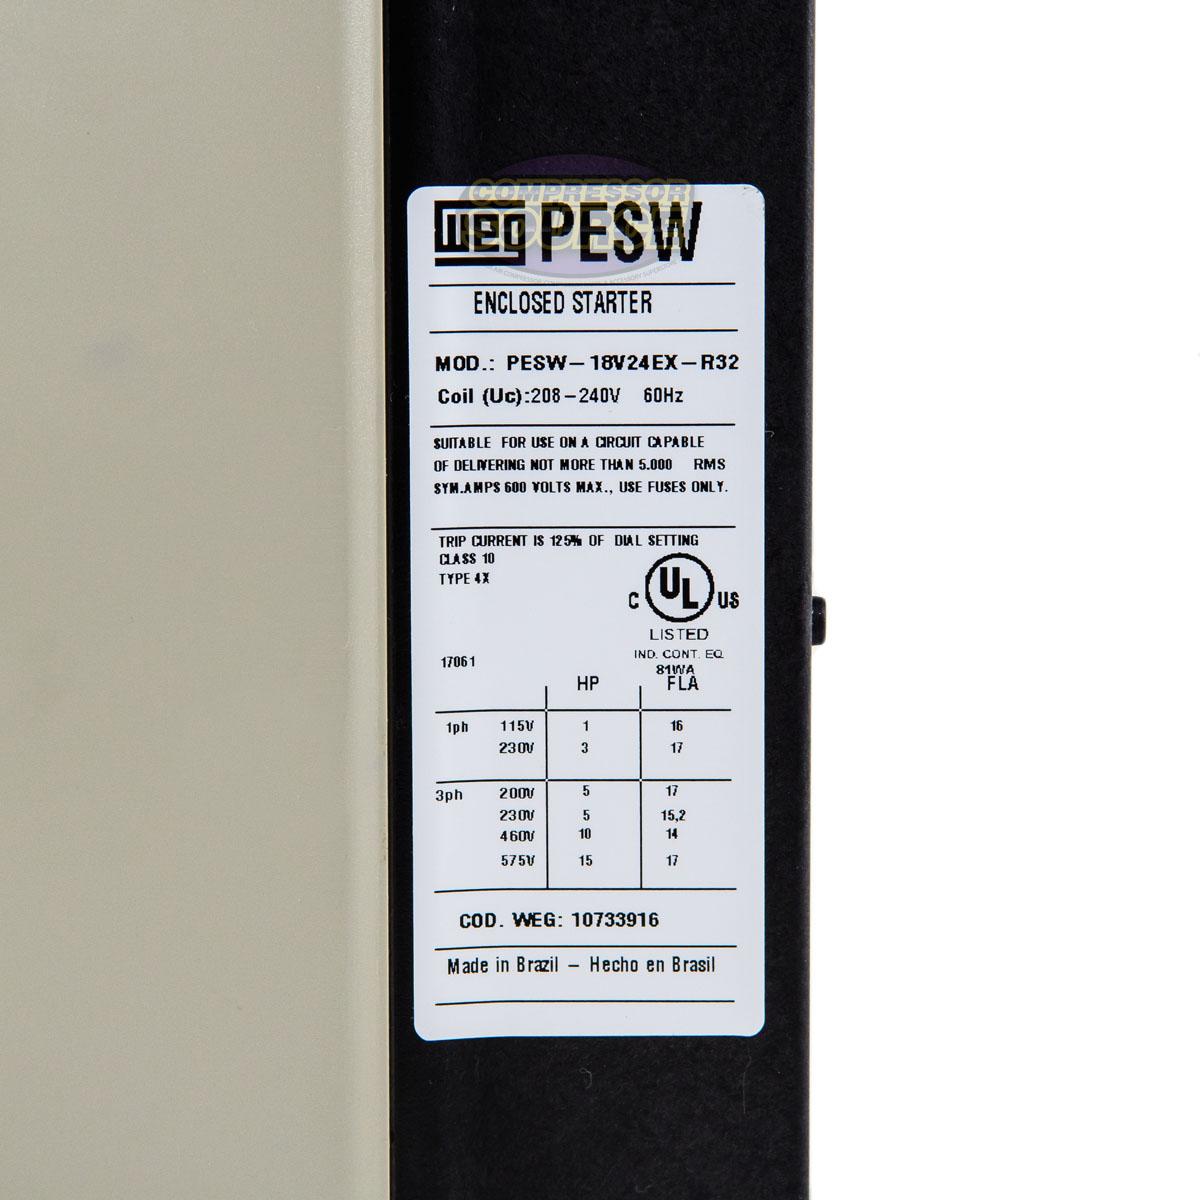 WEG 5 HP Three Phase Magnetic Starter Electric Motor Control NEMA4X 208-240 Volt